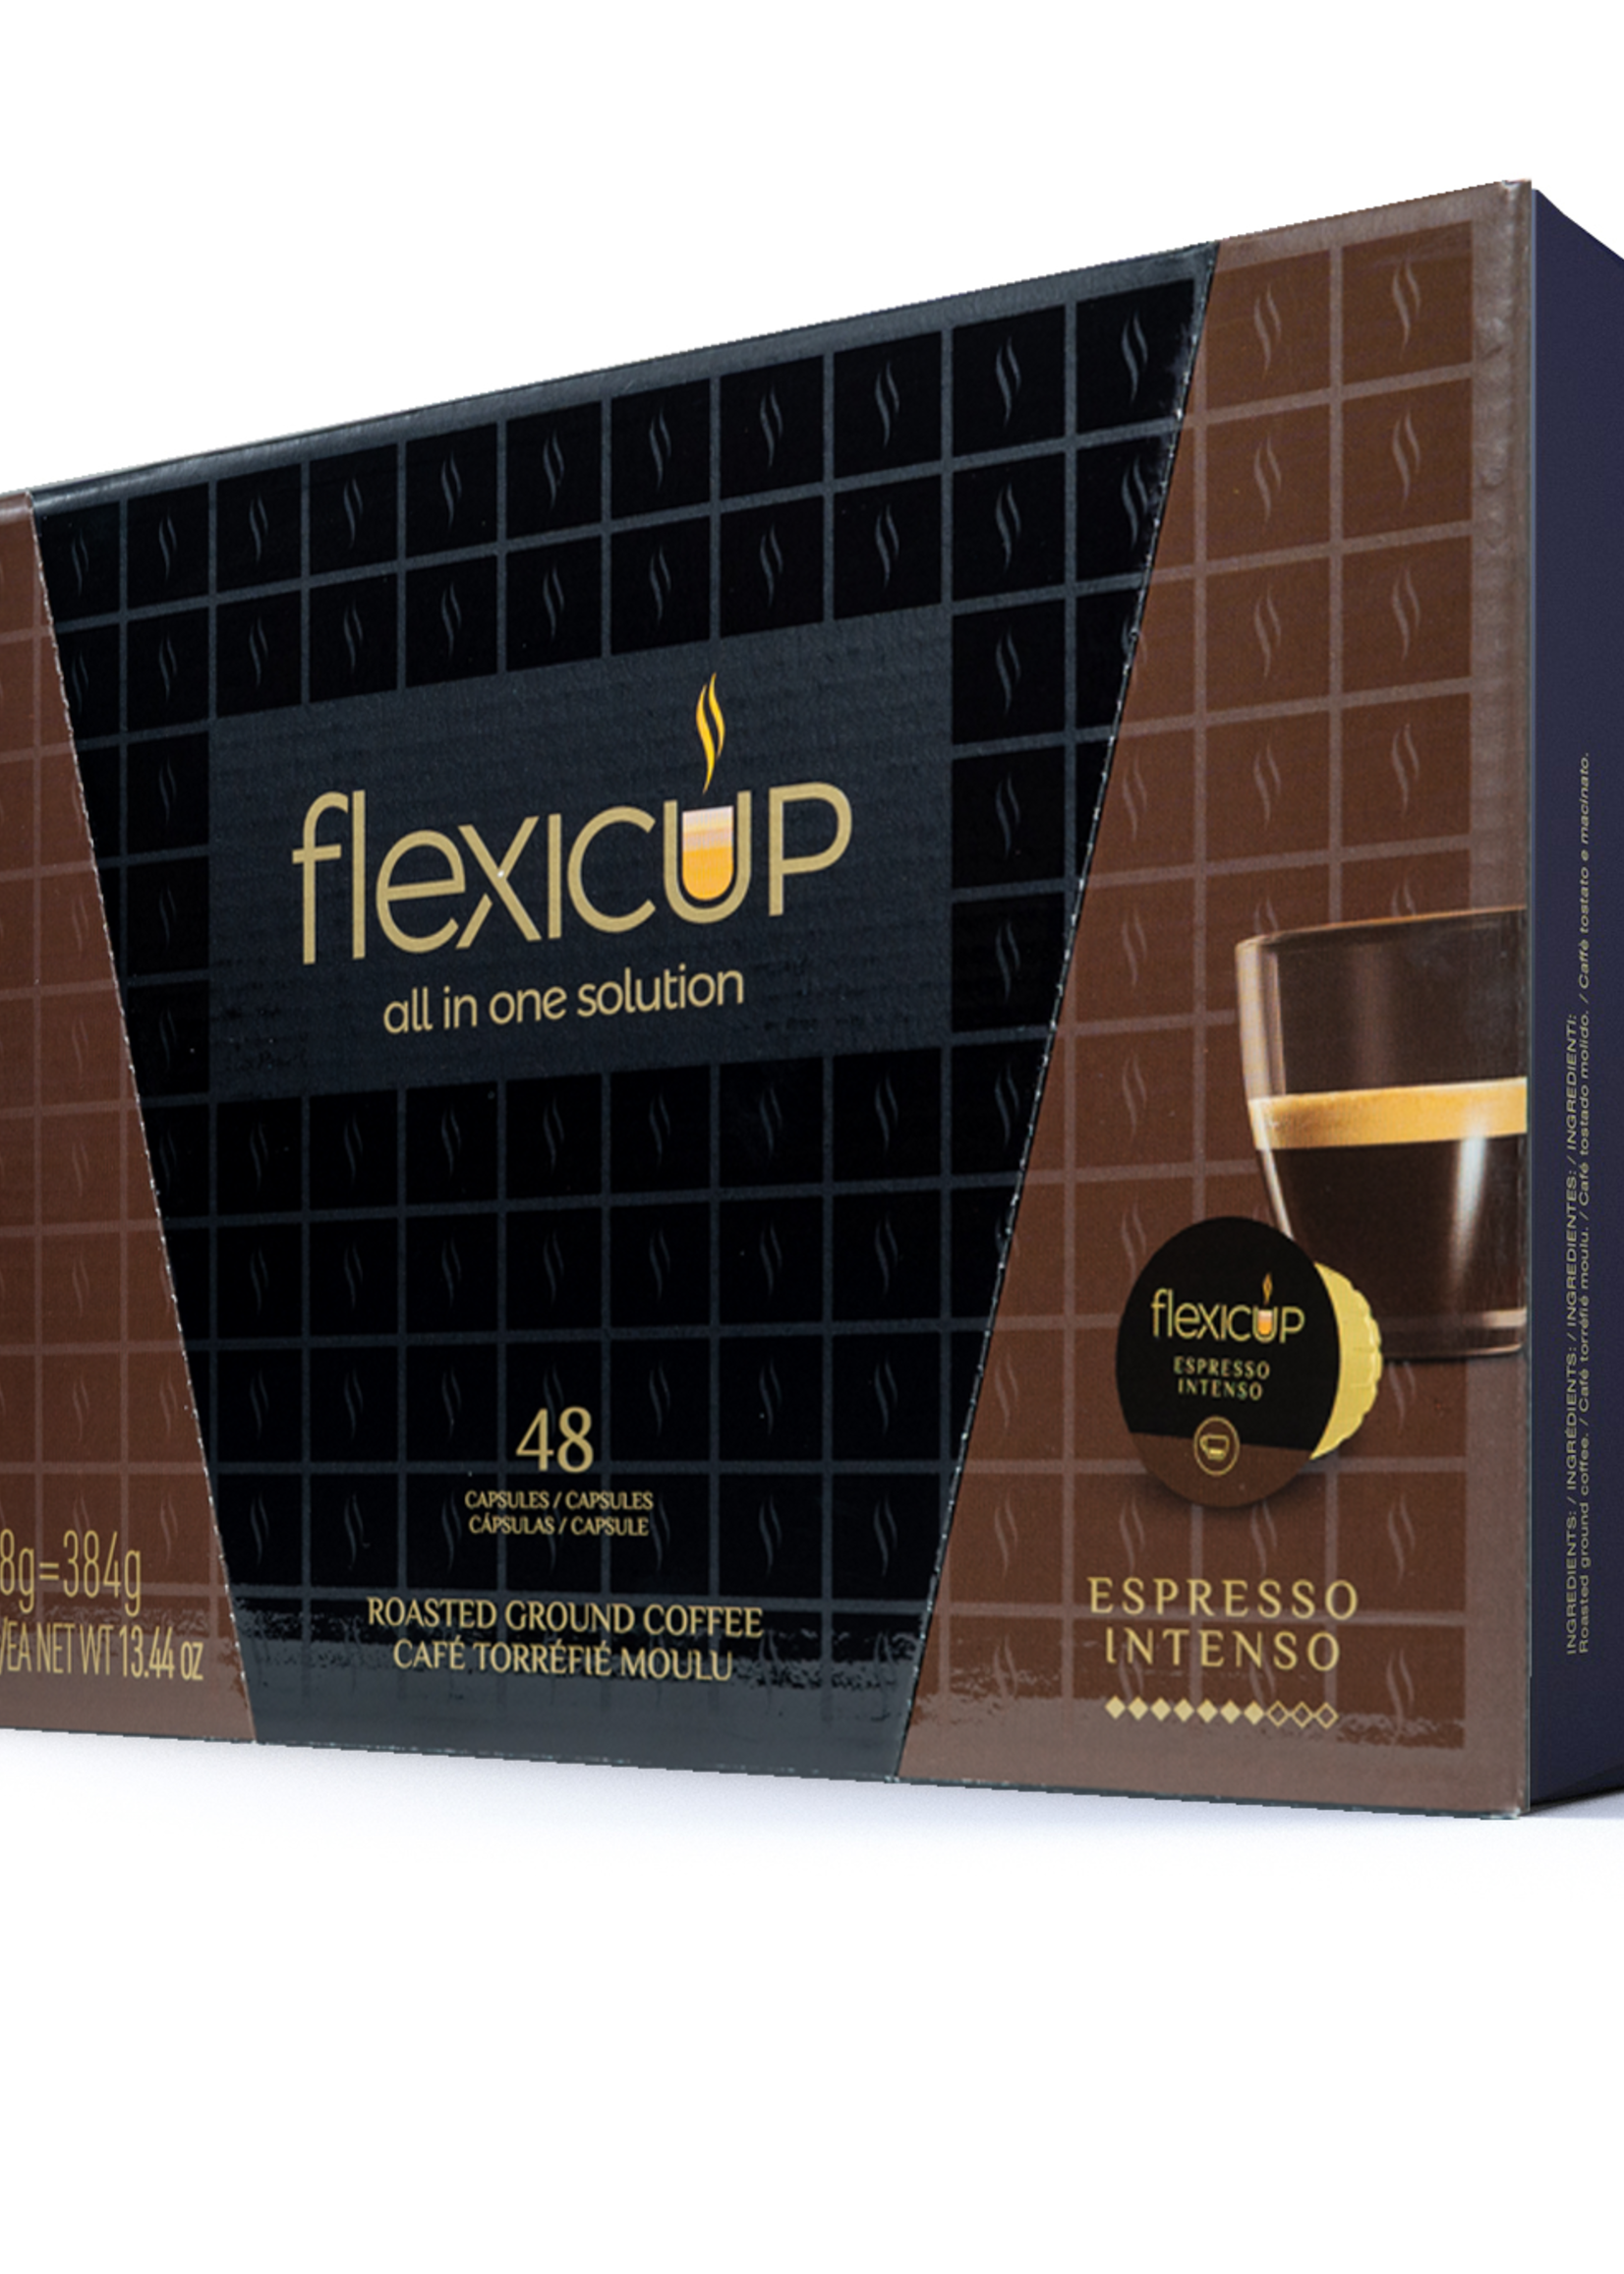 flexicup flexicup Espresso Intenso (48)